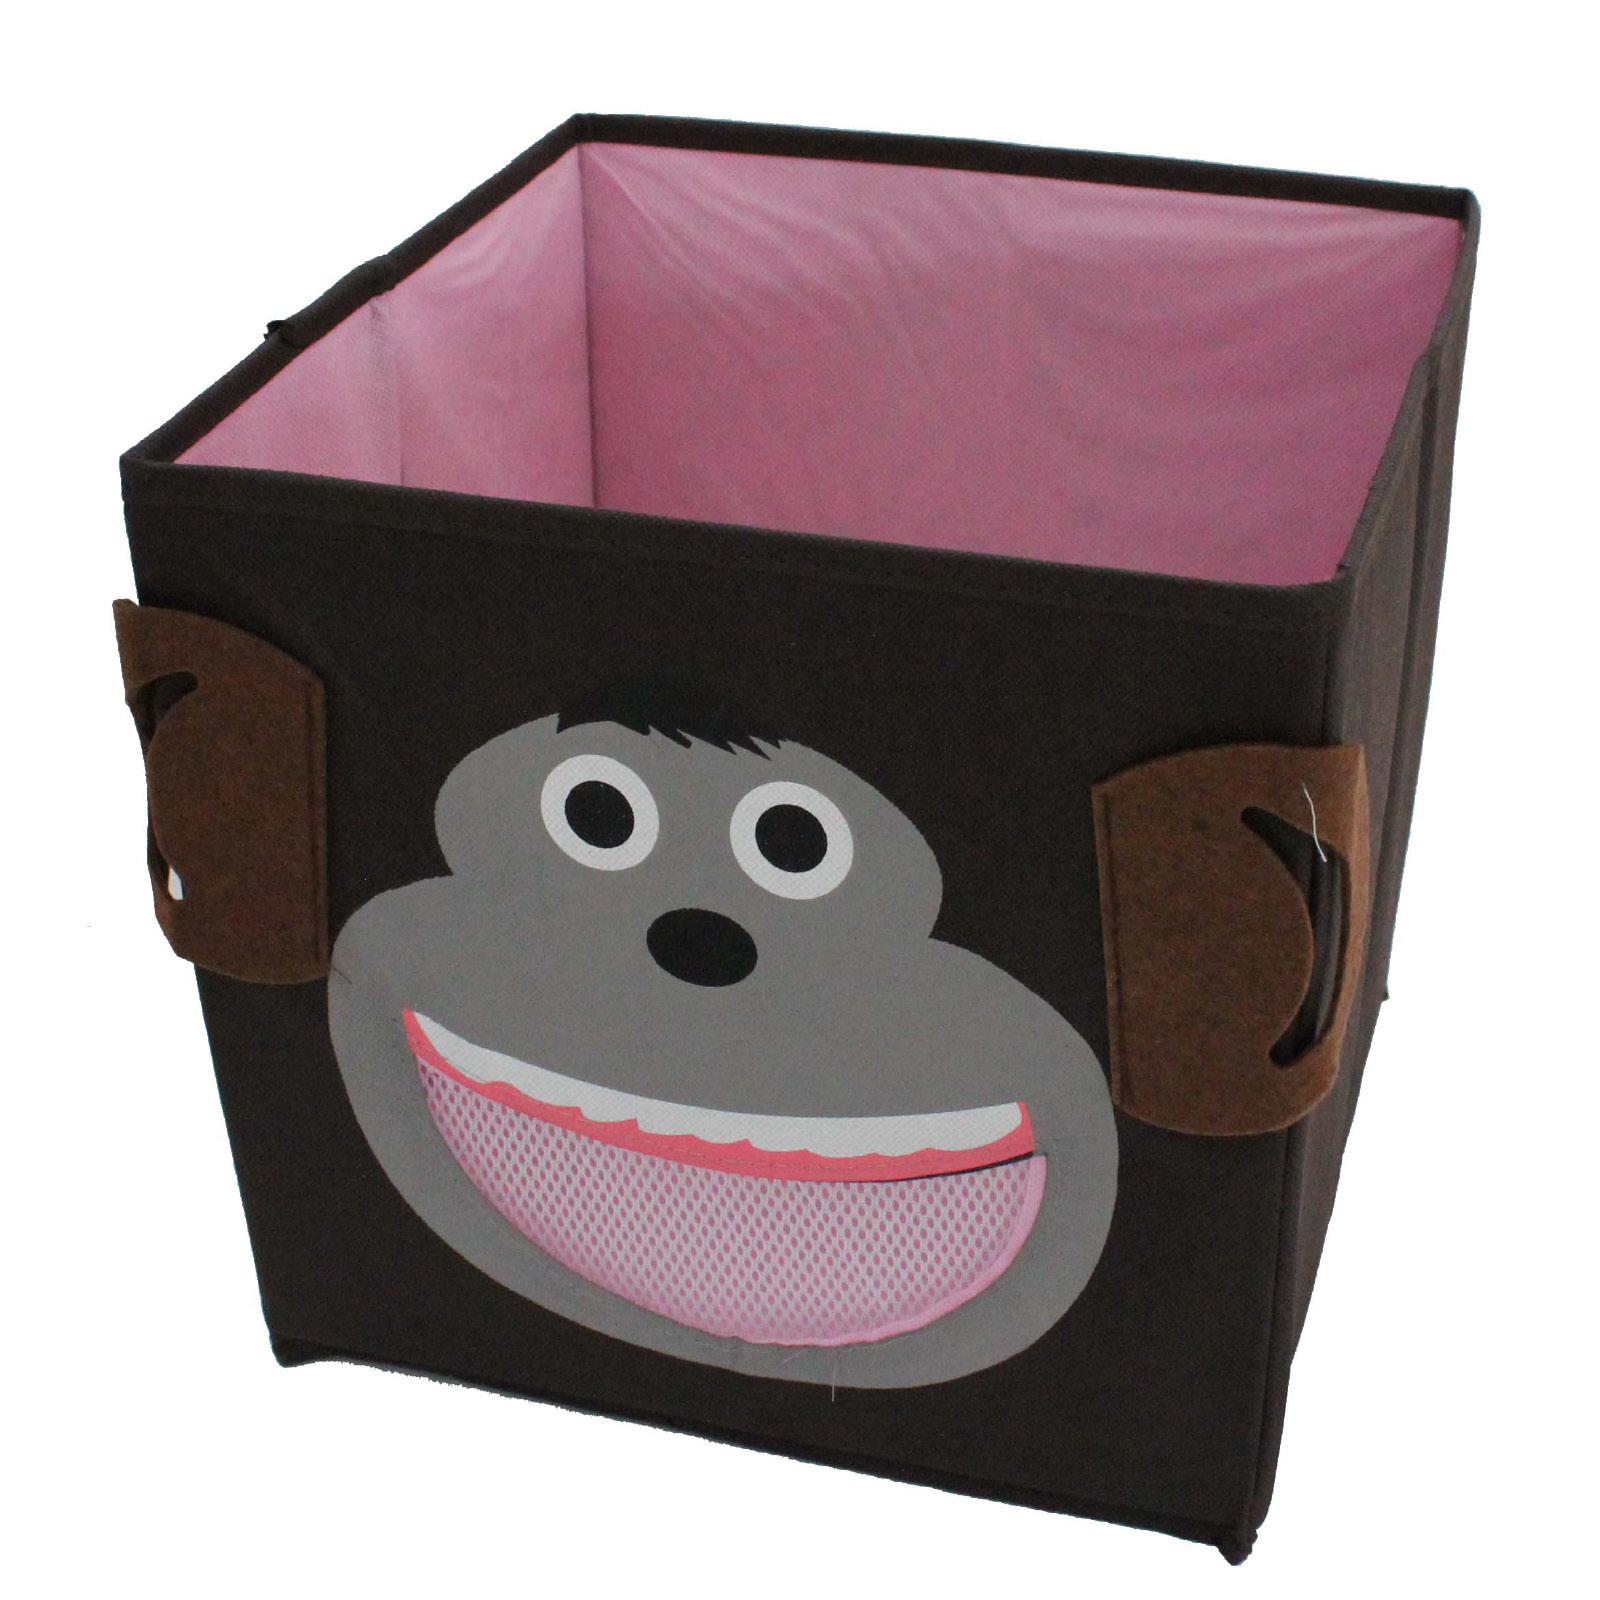 bo te de rangement livres bo te jouets box enfants jouet. Black Bedroom Furniture Sets. Home Design Ideas